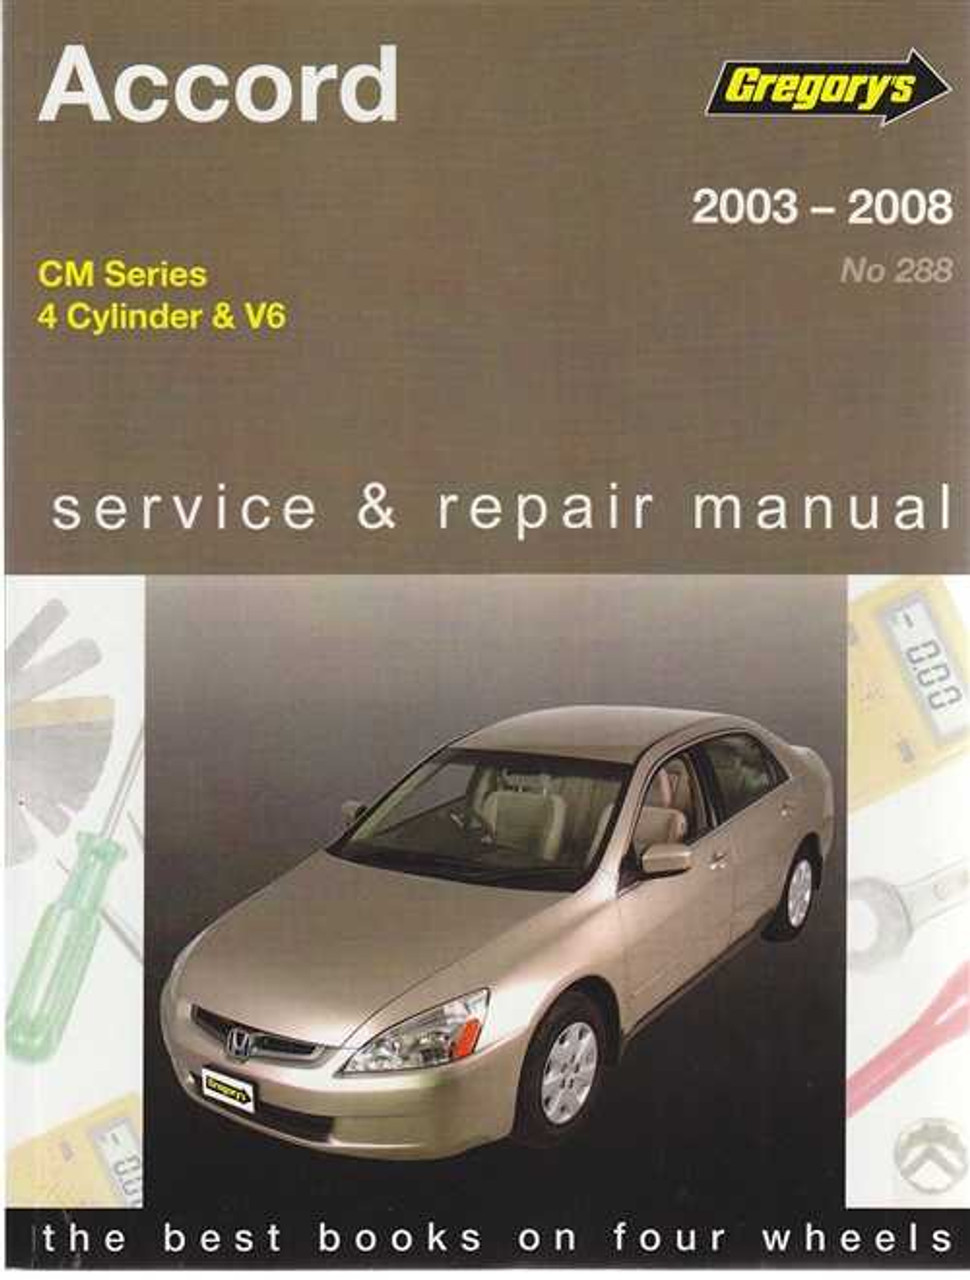 honda accord cm series 2003 2008 workshop manual rh automotobookshop com au 2006 honda accord repair manual 2008 honda accord repair manual pdf